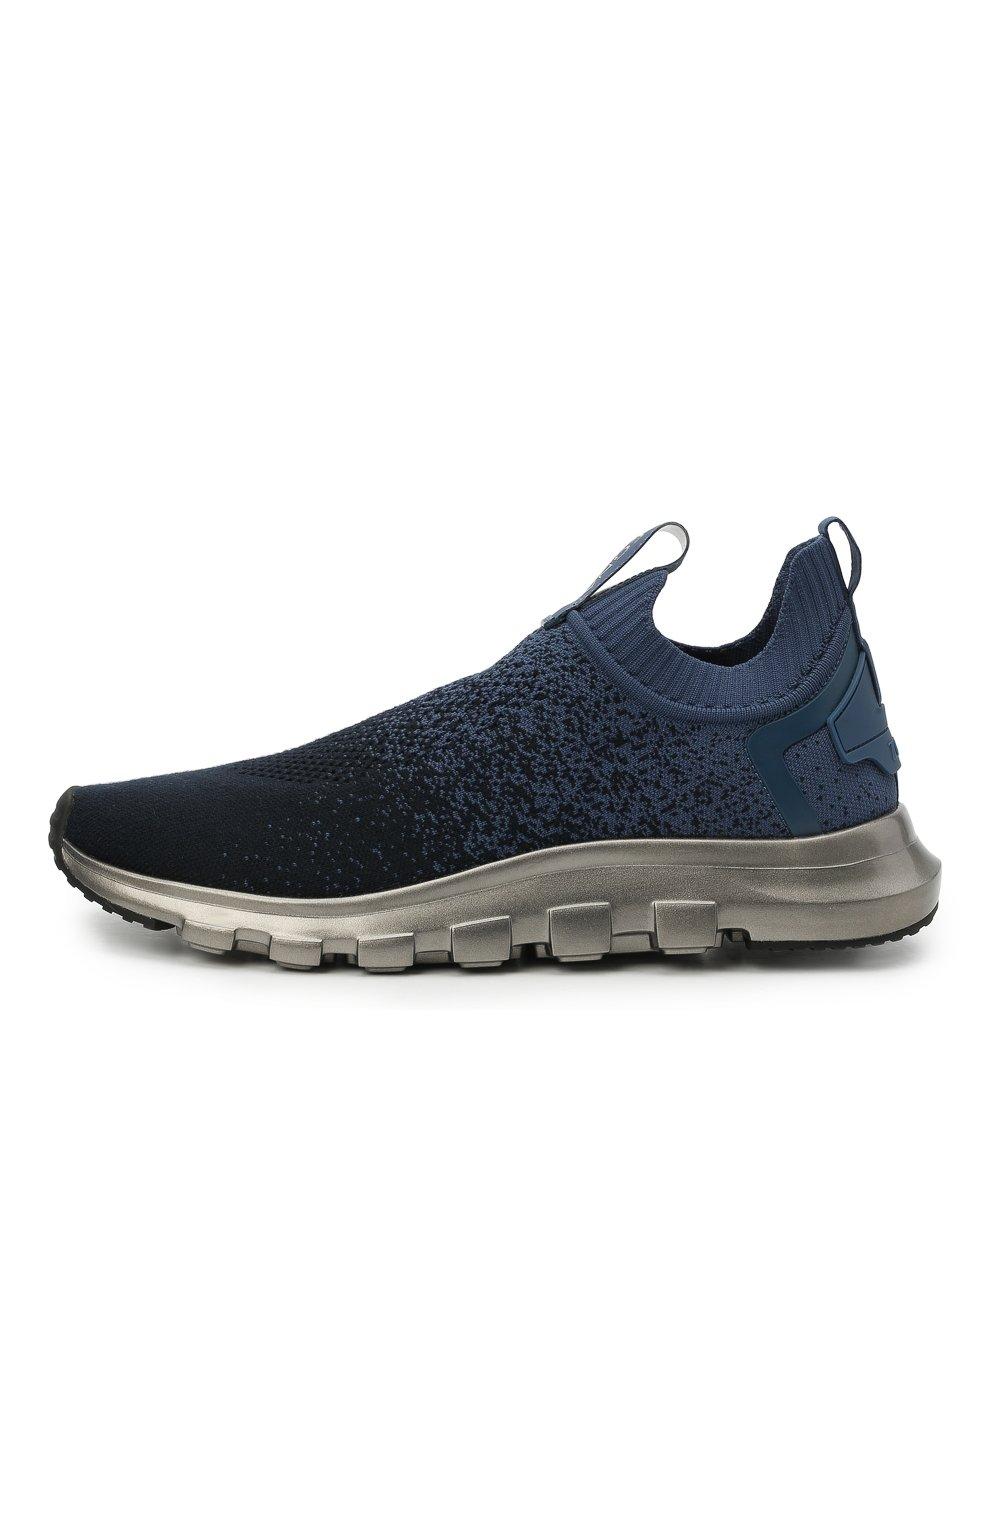 Мужские текстильные кроссовки techmerino sock 2.0 Z ZEGNA темно-синего цвета, арт. A4923X-LHLLA   Фото 3 (Материал внешний: Текстиль; Материал внутренний: Текстиль; Подошва: Массивная; Стили: Спорт)